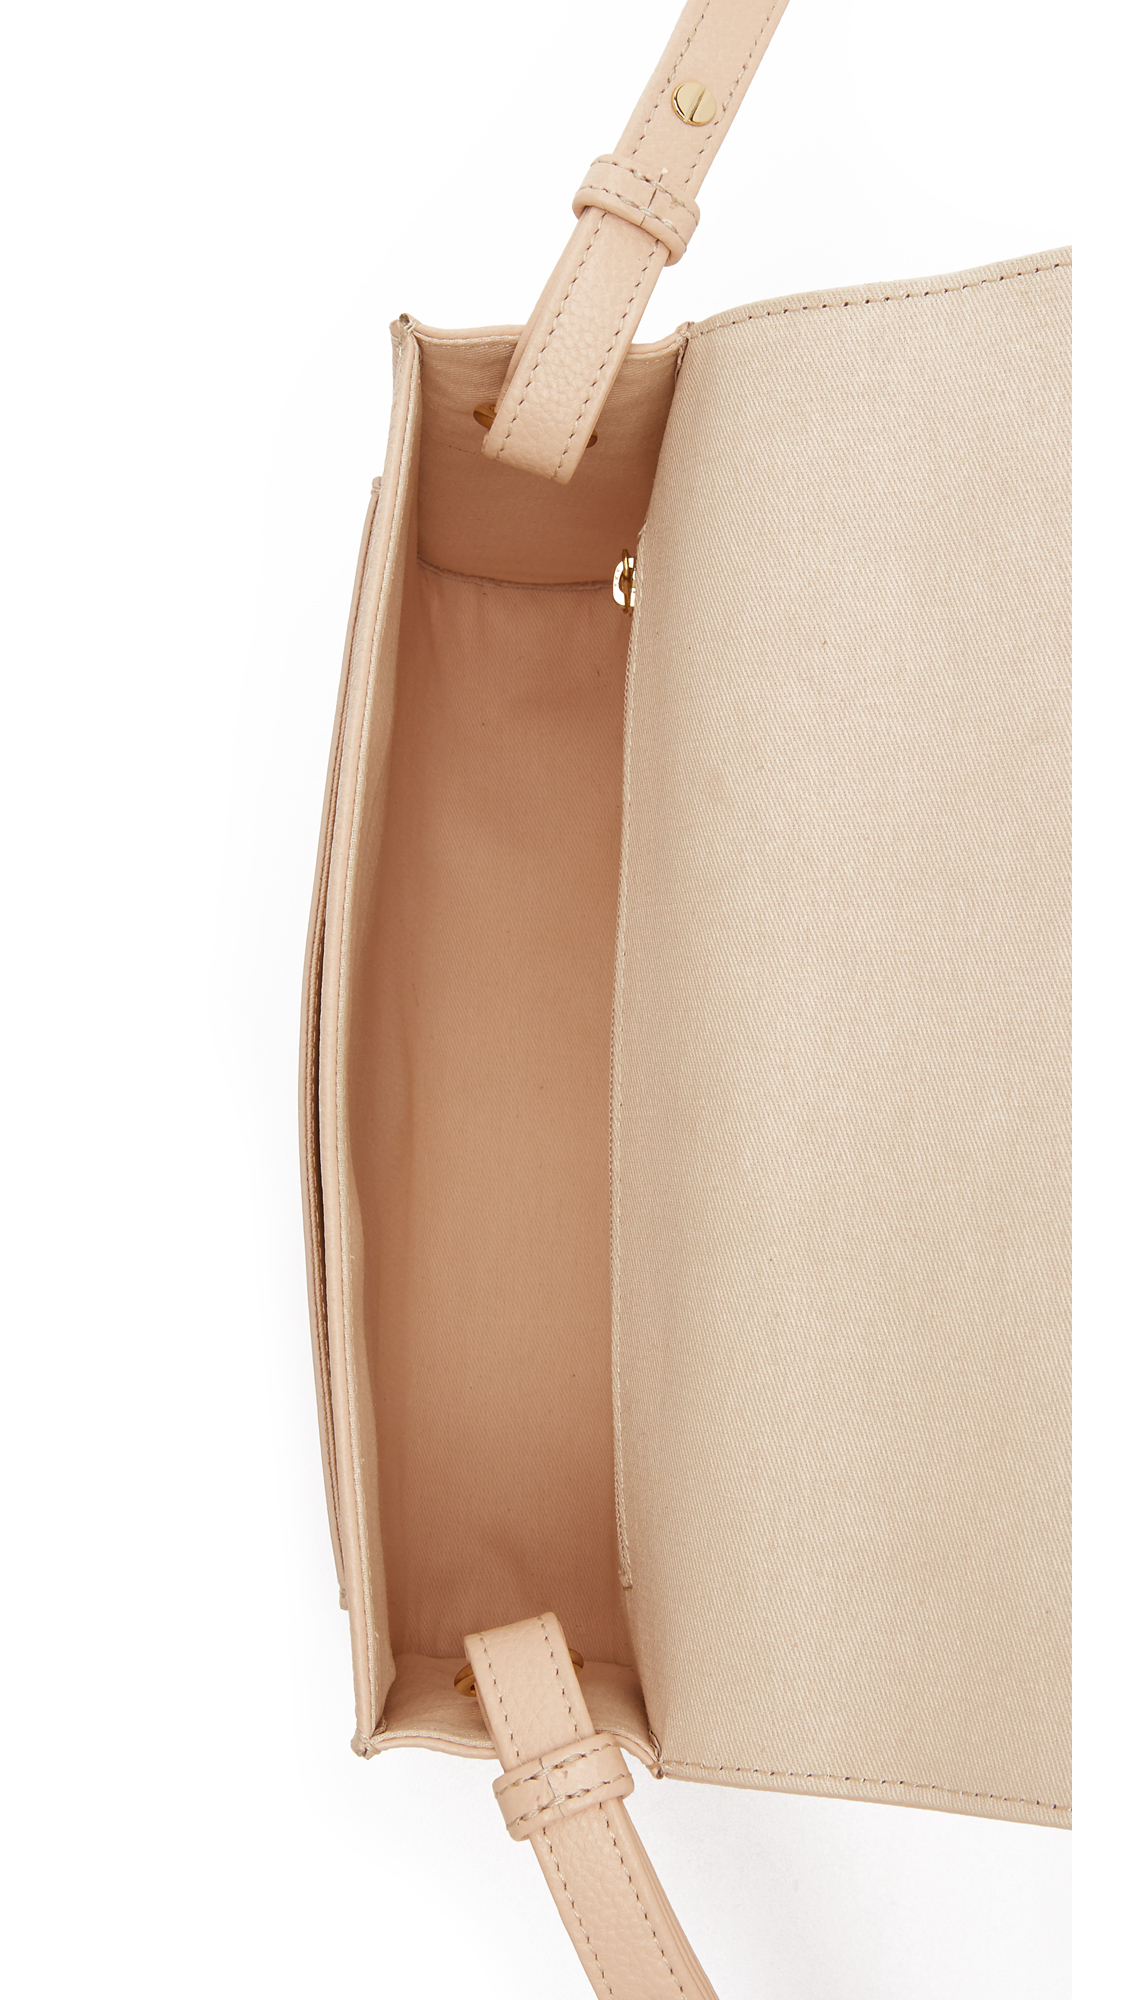 chloe black and white bag - chloe leather flap clutch, chloe pumps online